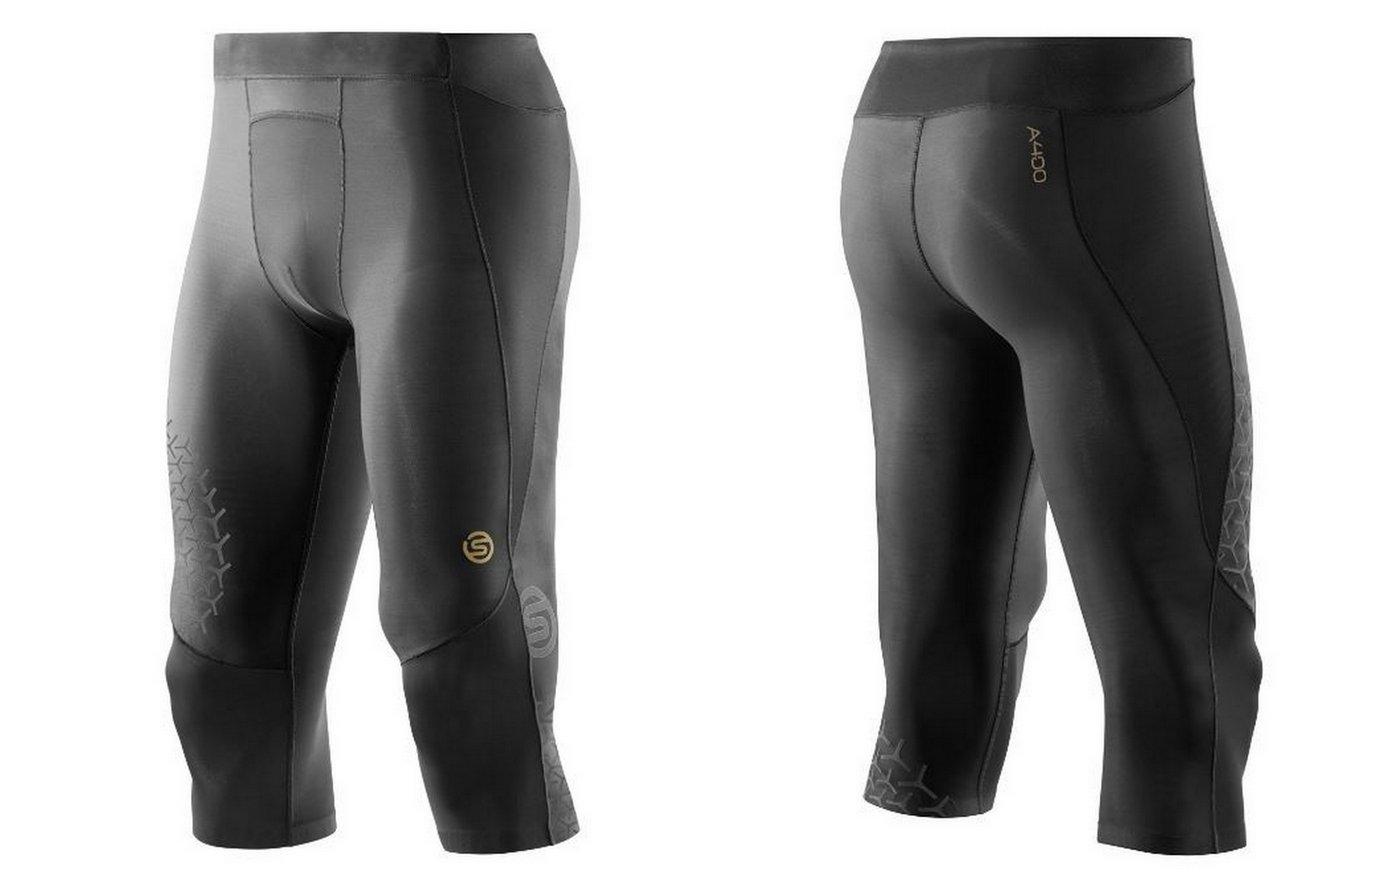 Skins דנה עופר גיא Saucony shorts2